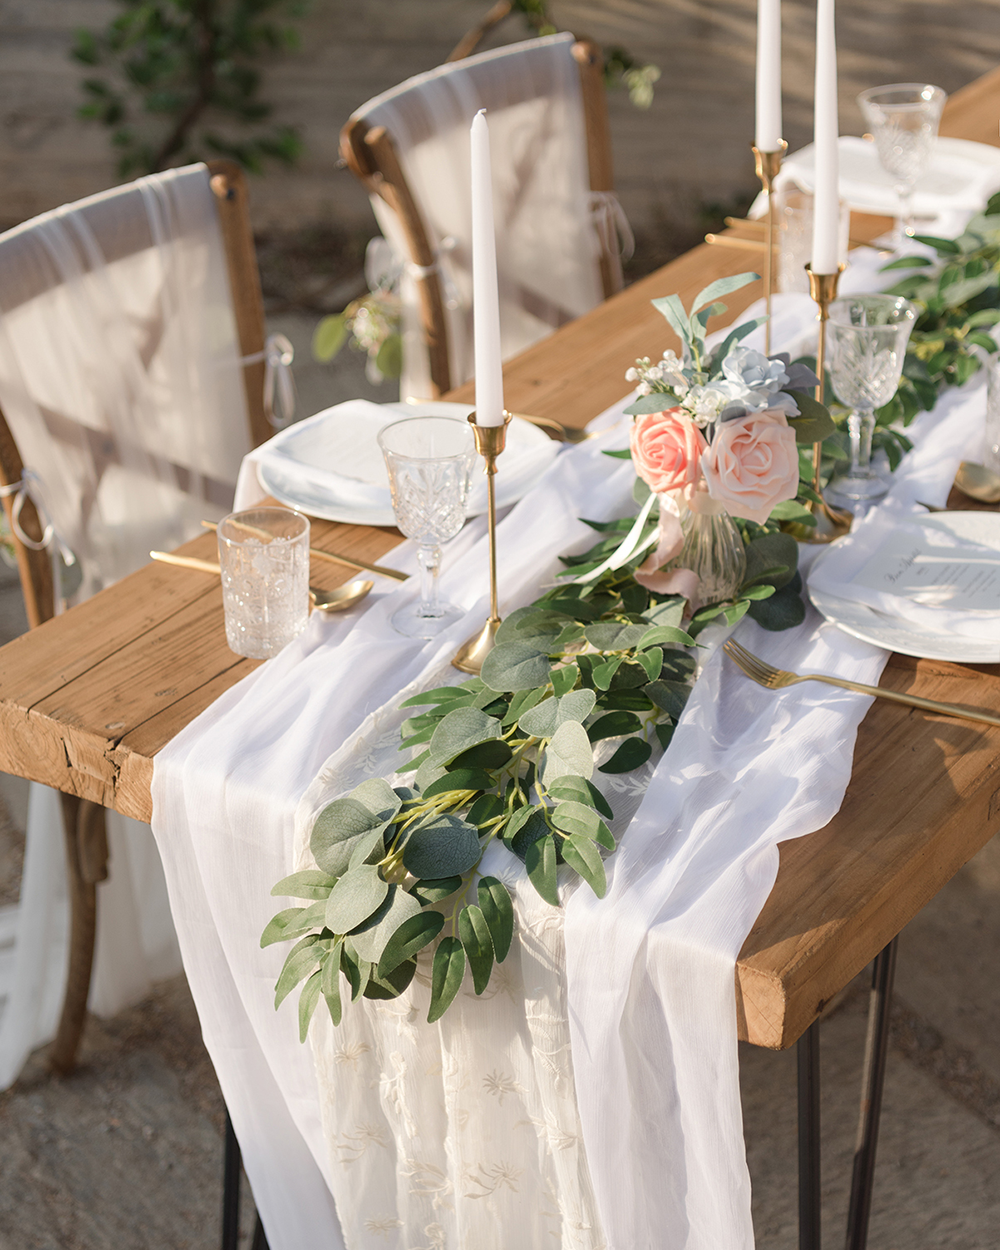 Sweetheart Table Decor Ideas We Adore